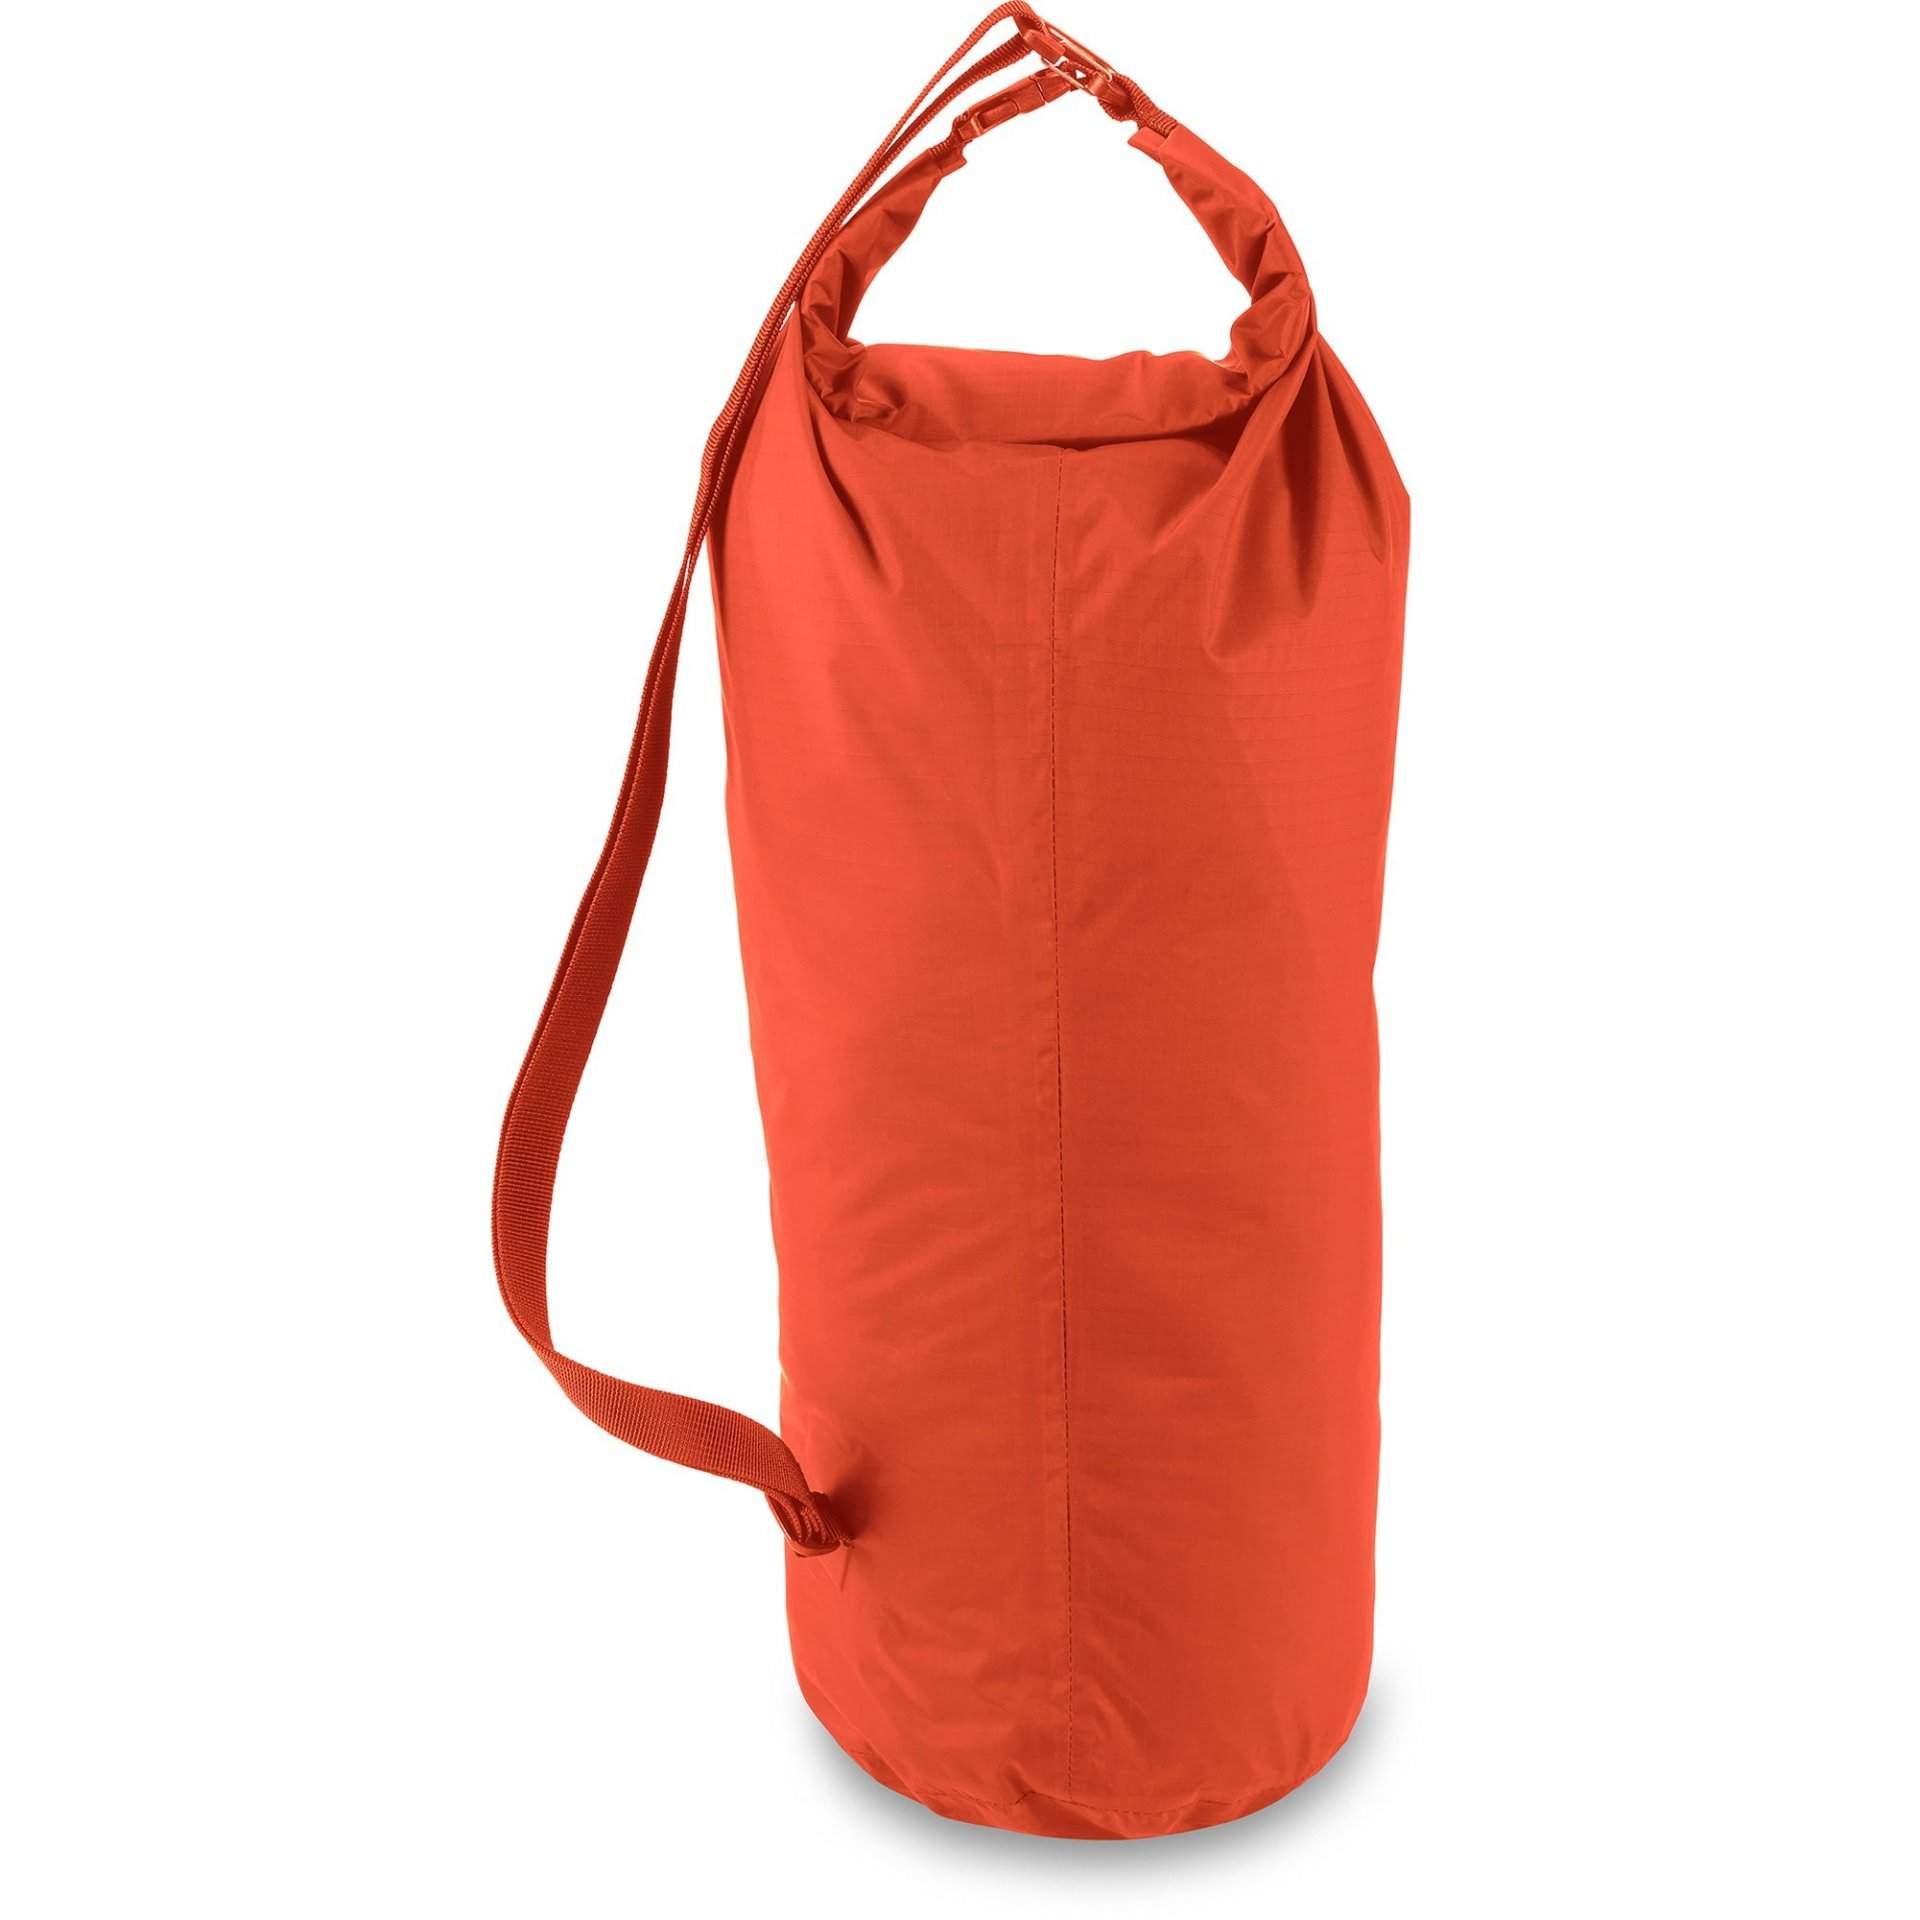 PLECAK DAKINE PACKABLE ROLLTOP DRY BAG 20L SUN FLARE 2